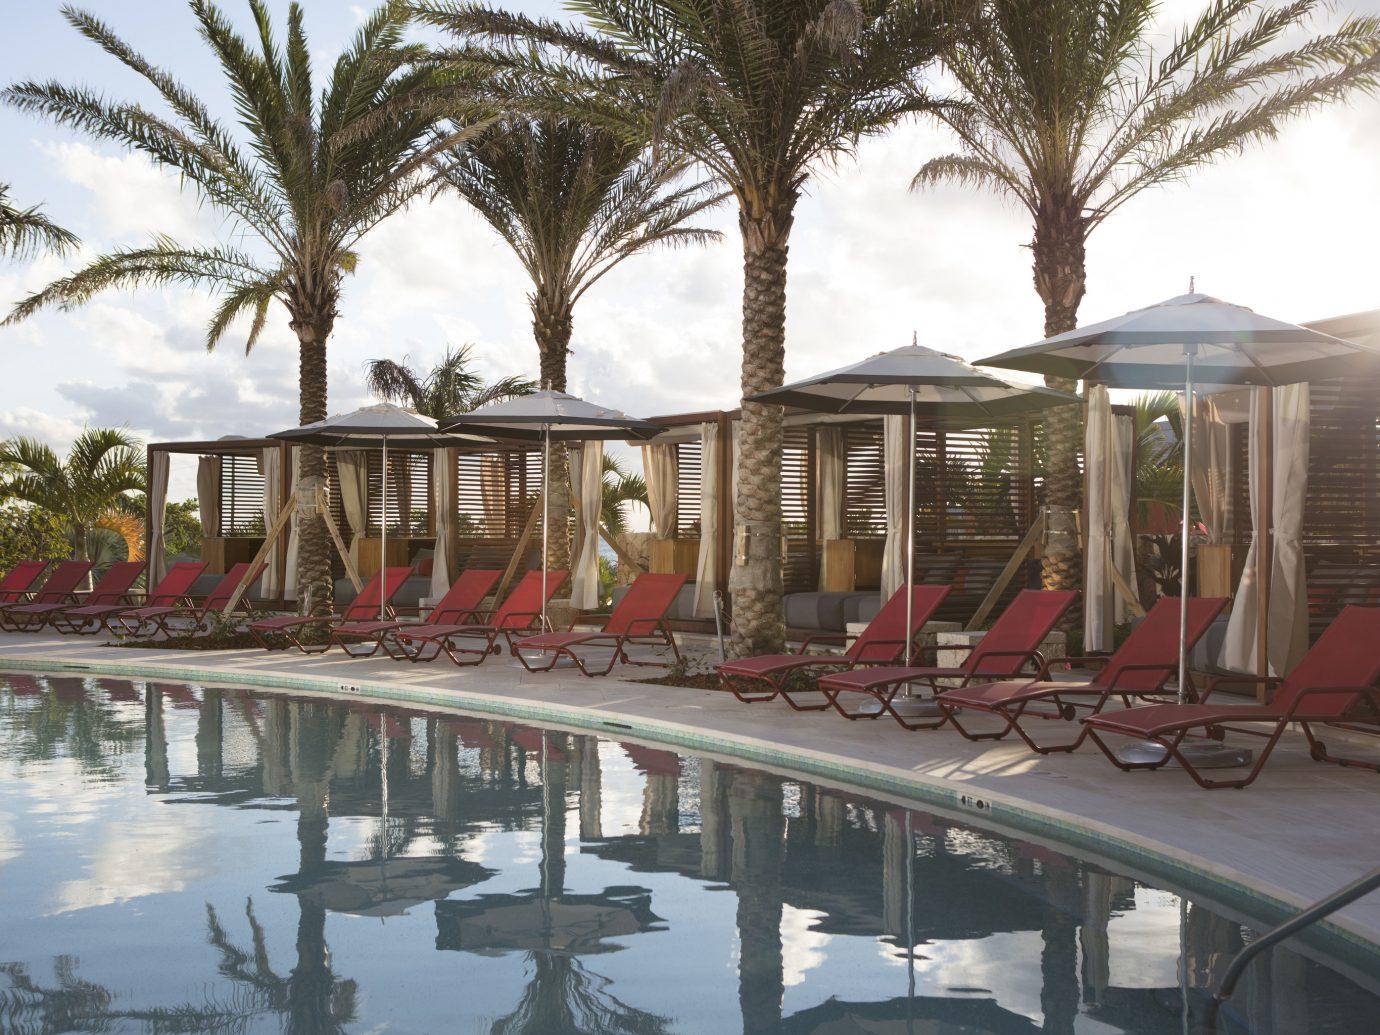 Hotels outdoor tree sky Resort vacation arecales waterway walkway palm several